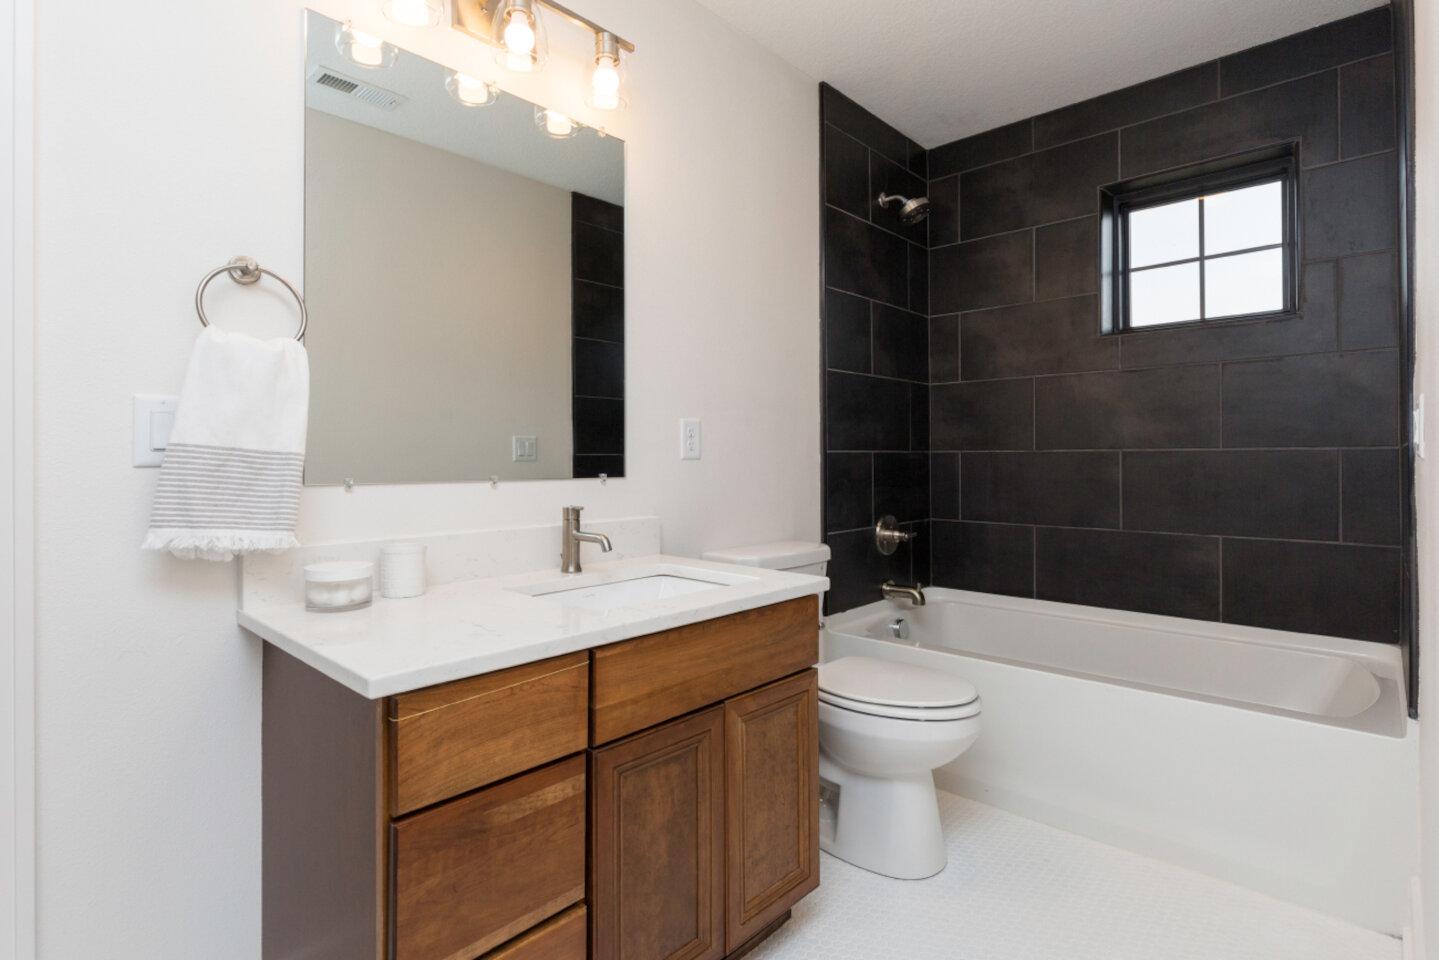 The Eleanor Custom Home - bath, toilet and sick.